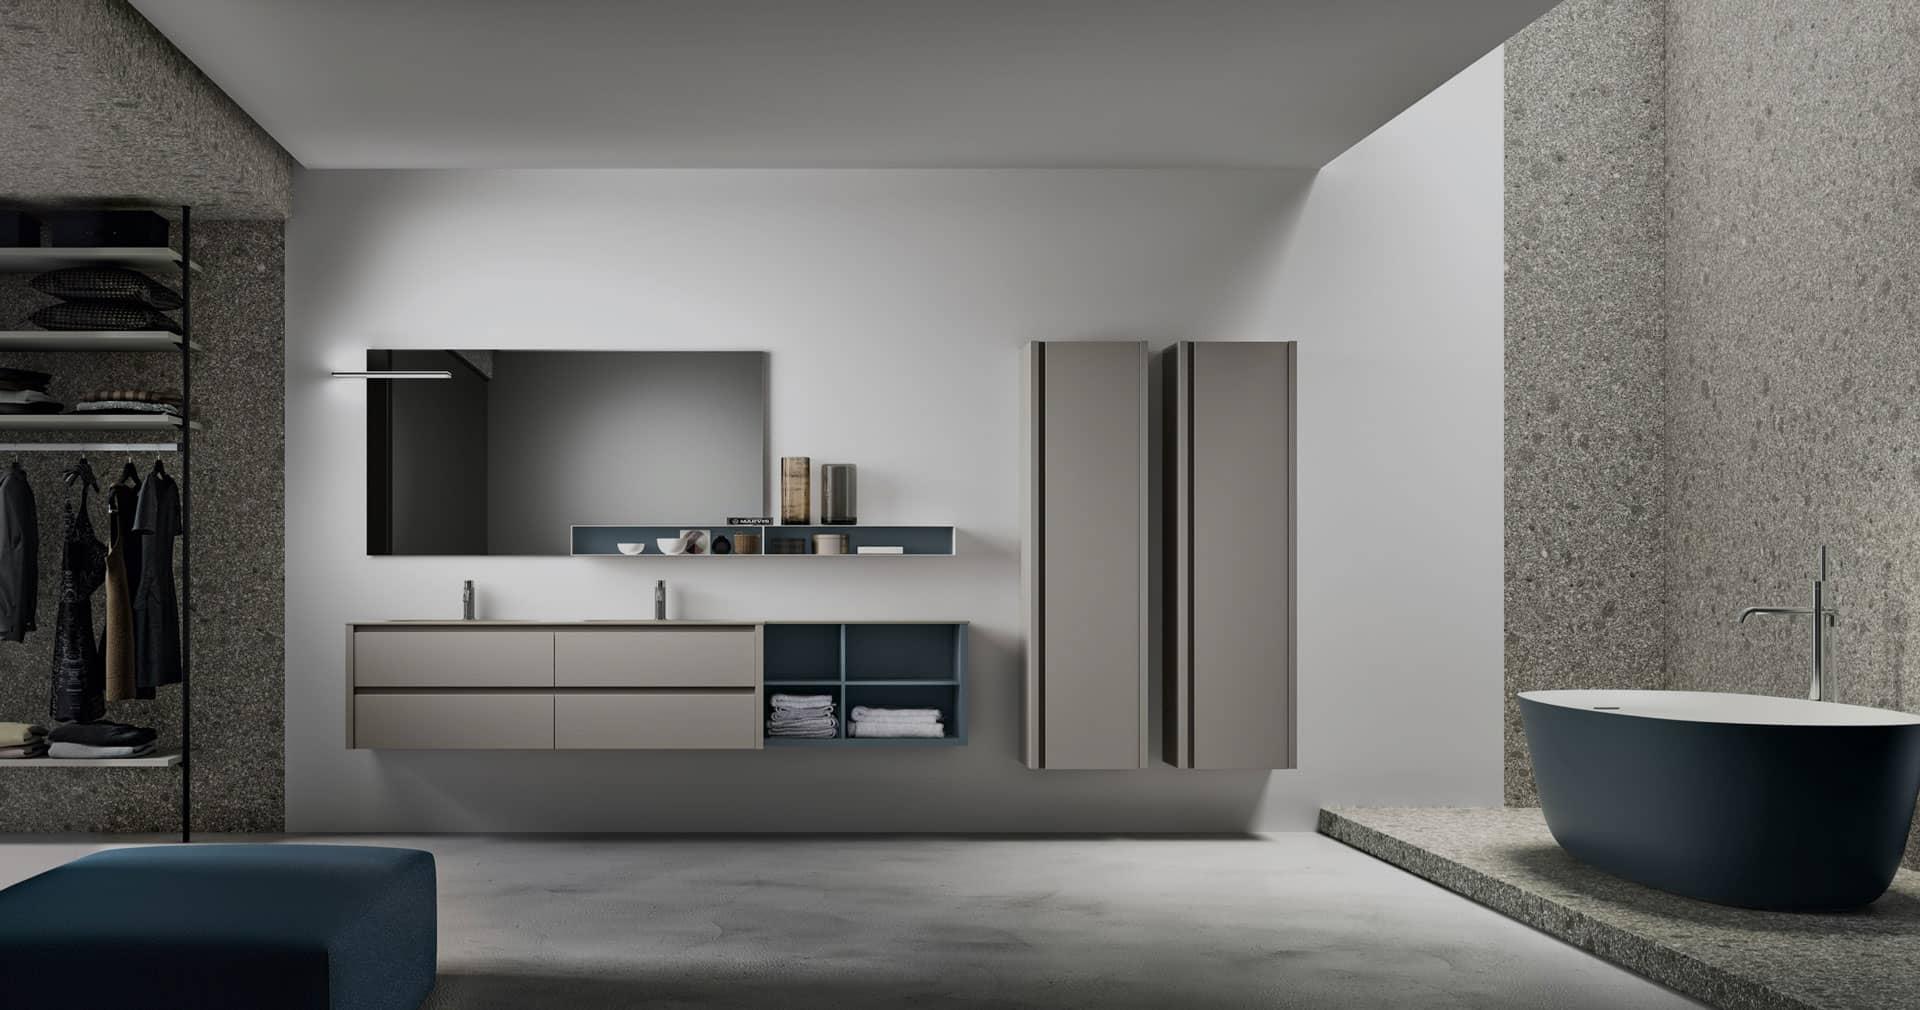 Bathroom furniture,bathroom cabinets - minimal1